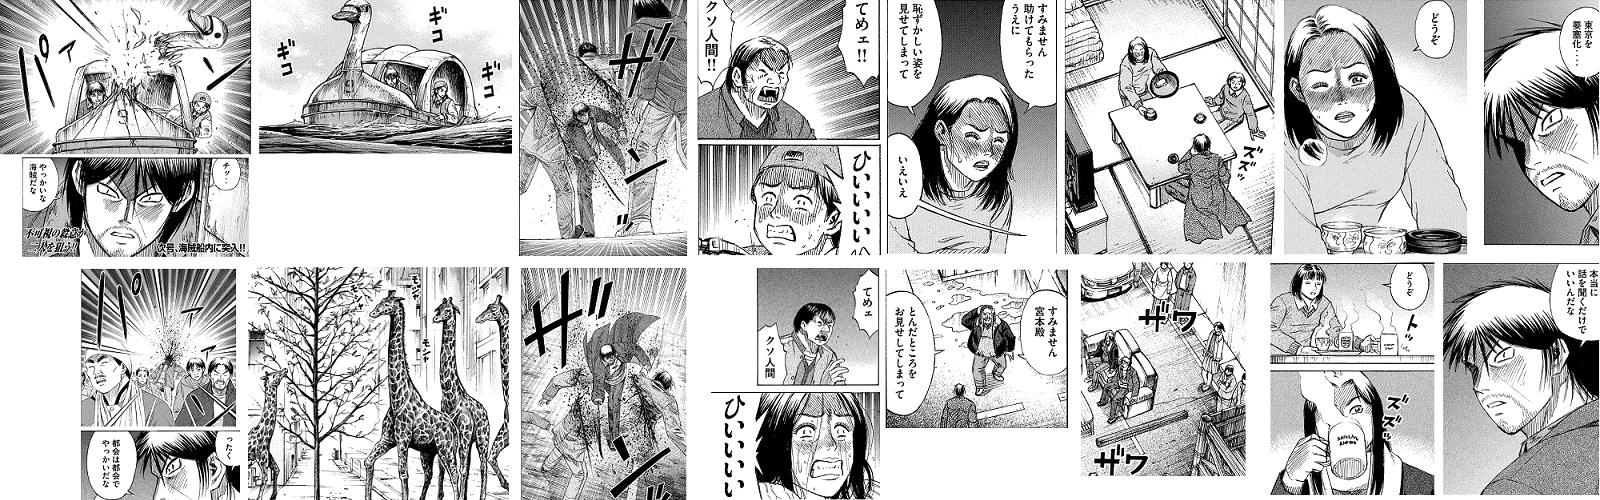 higanjima_48nichigo62-16011808.jpg